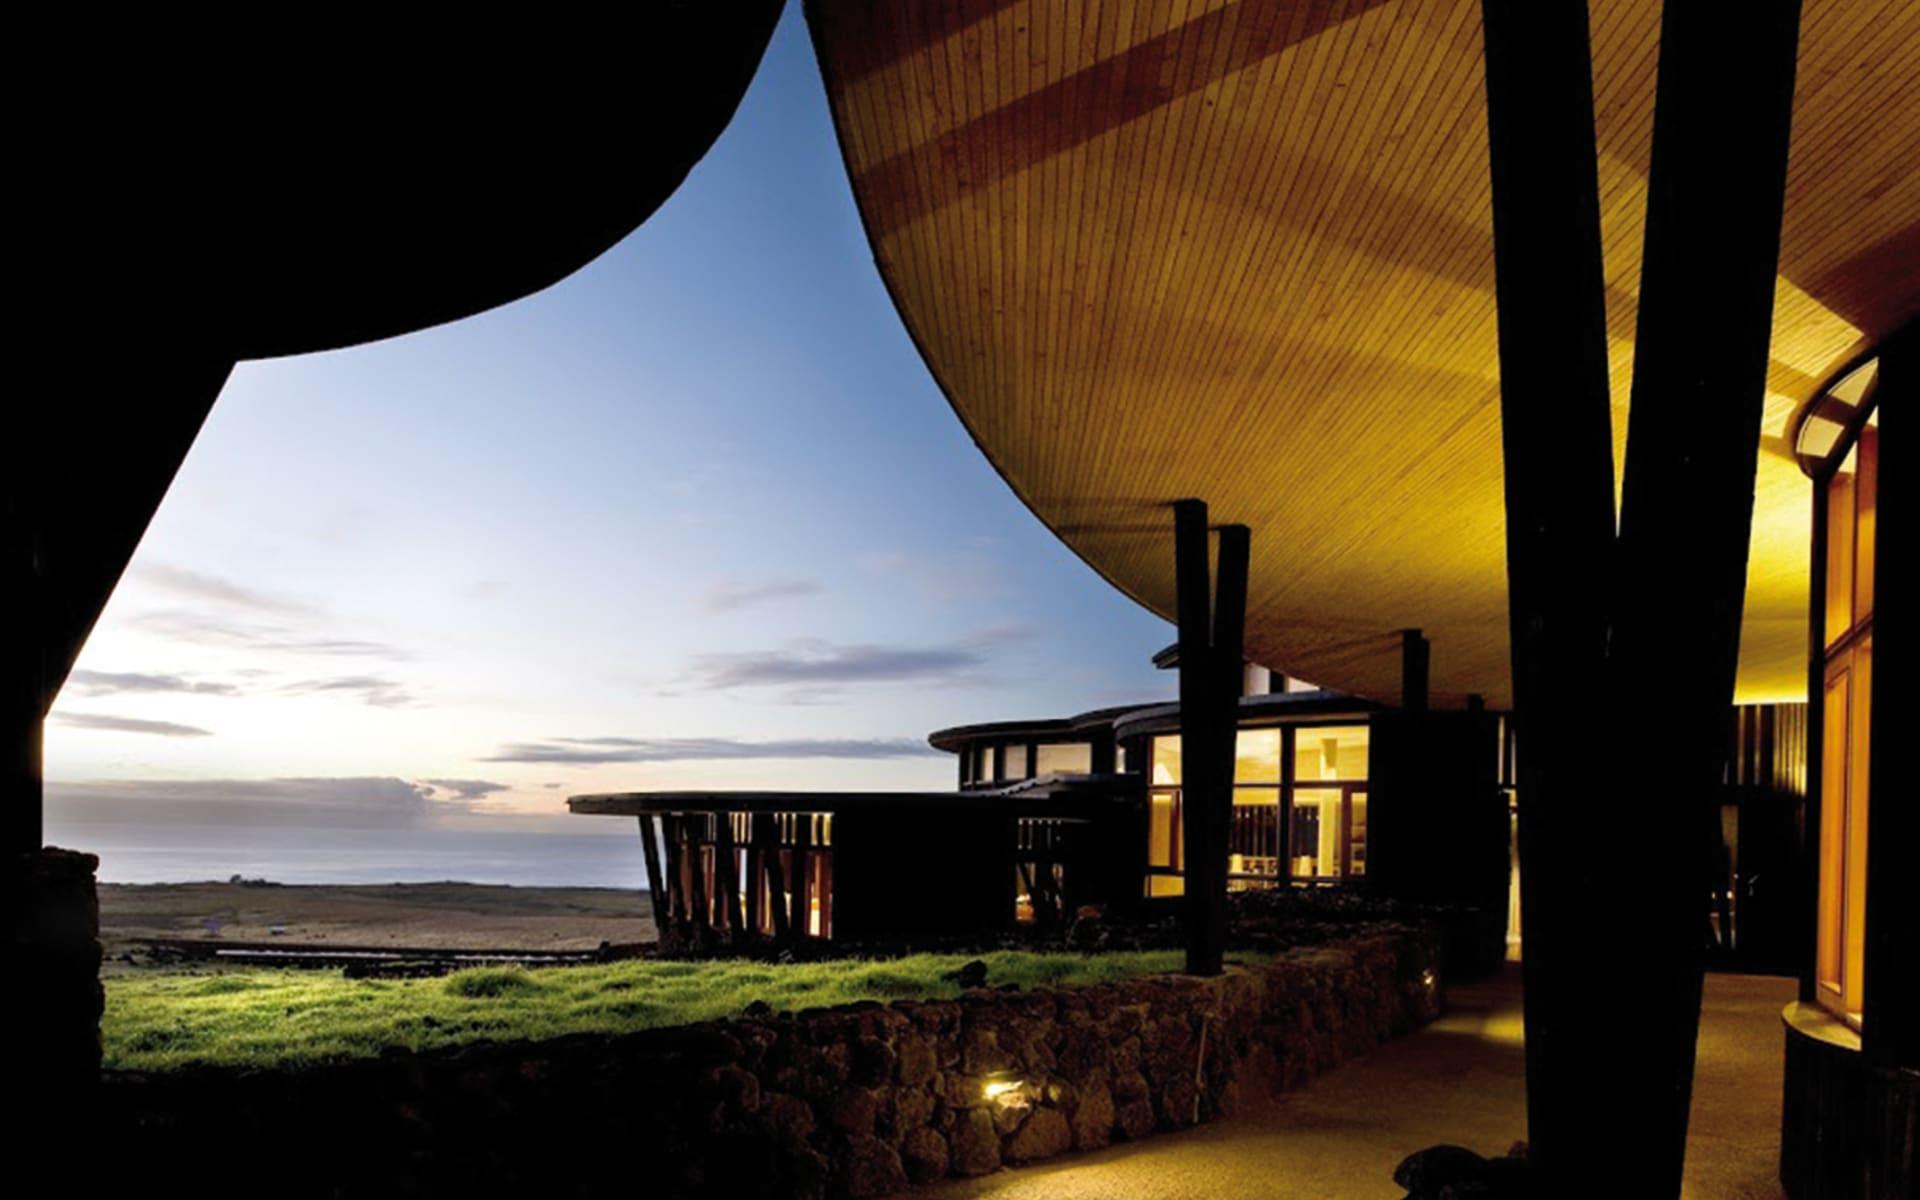 explora Rapa Nui ab Hanga Roa: exterior: 14_145_02 Explor Rapa Nui Aussen